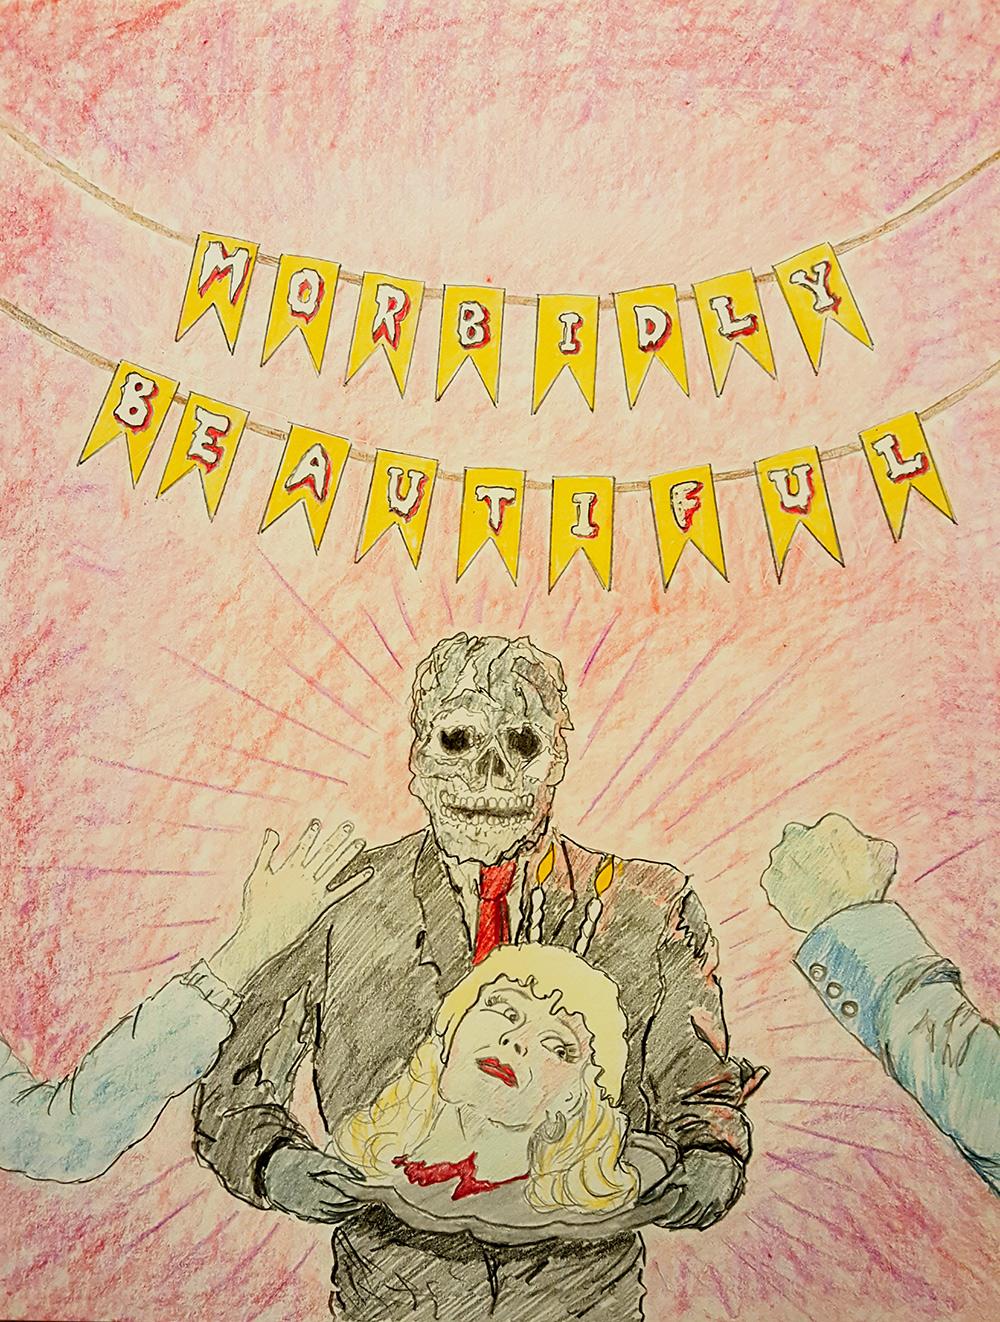 Morbidly Beautiful Birthday